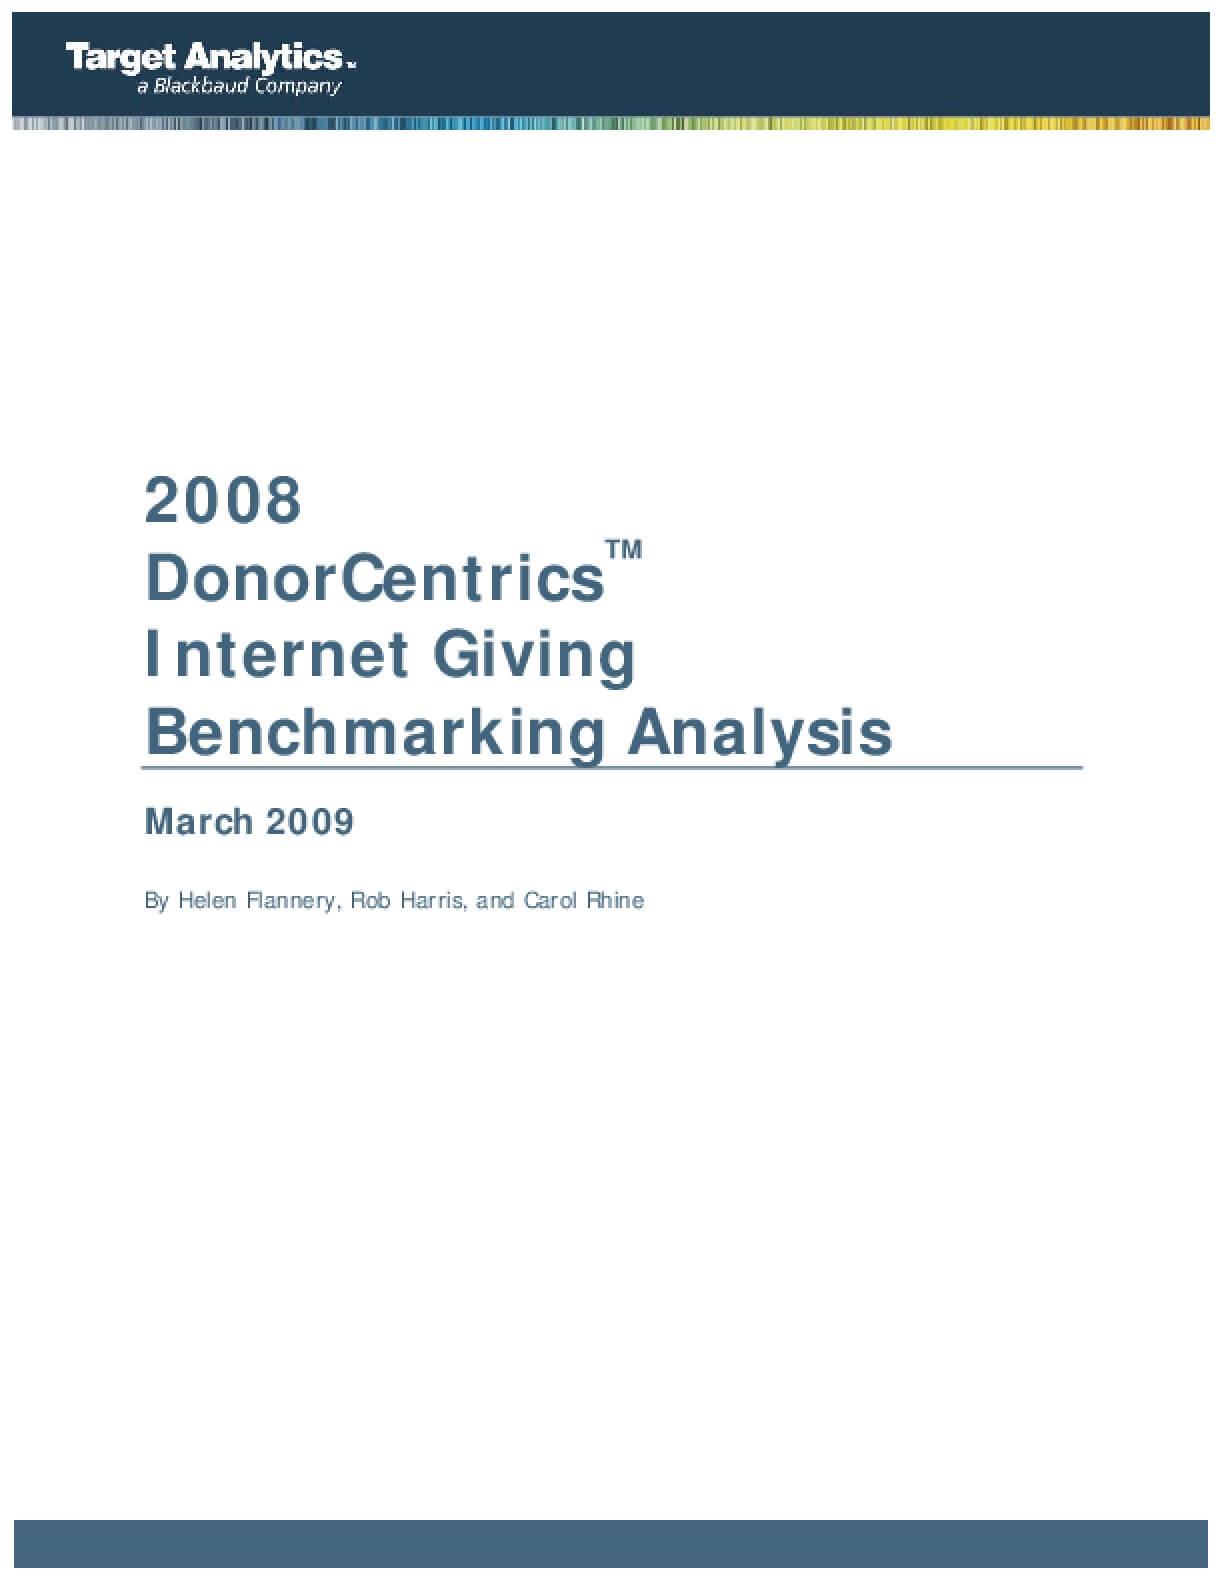 2008 DonorCentrics Internet Giving Benchmarking Analysis